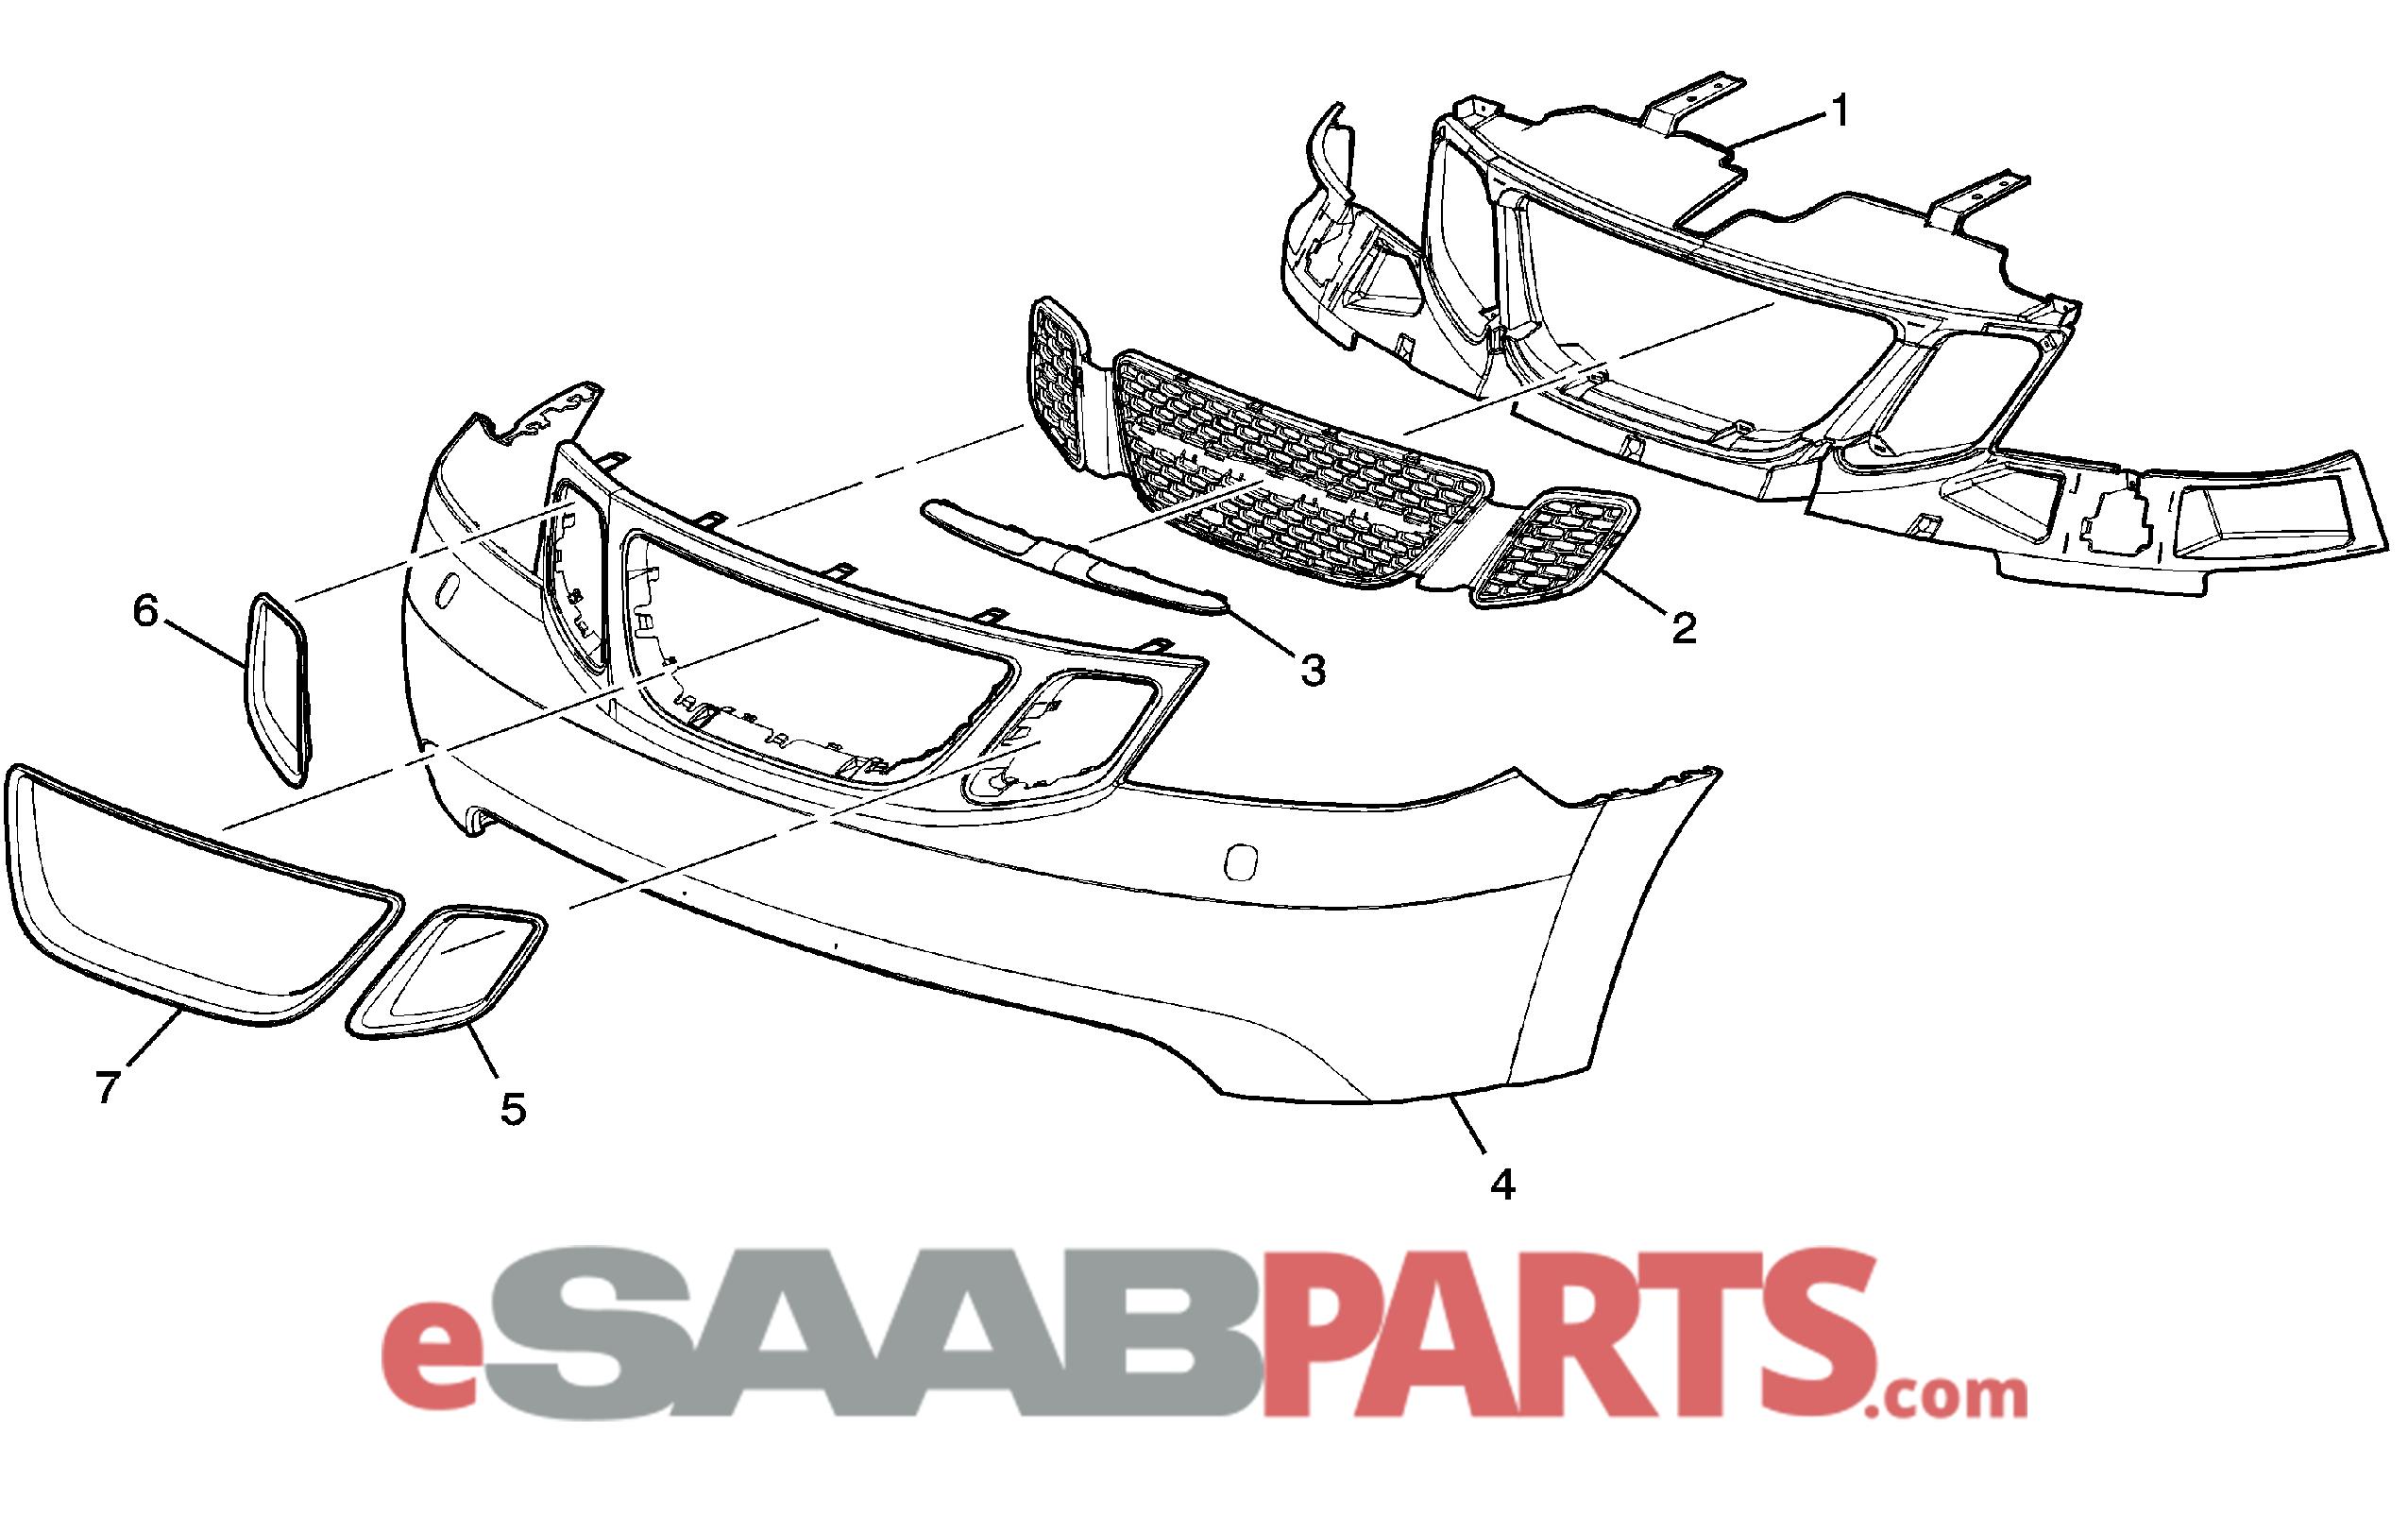 [19148958] SAAB 9-7X Front Bumper Cover (w/ Headlamp